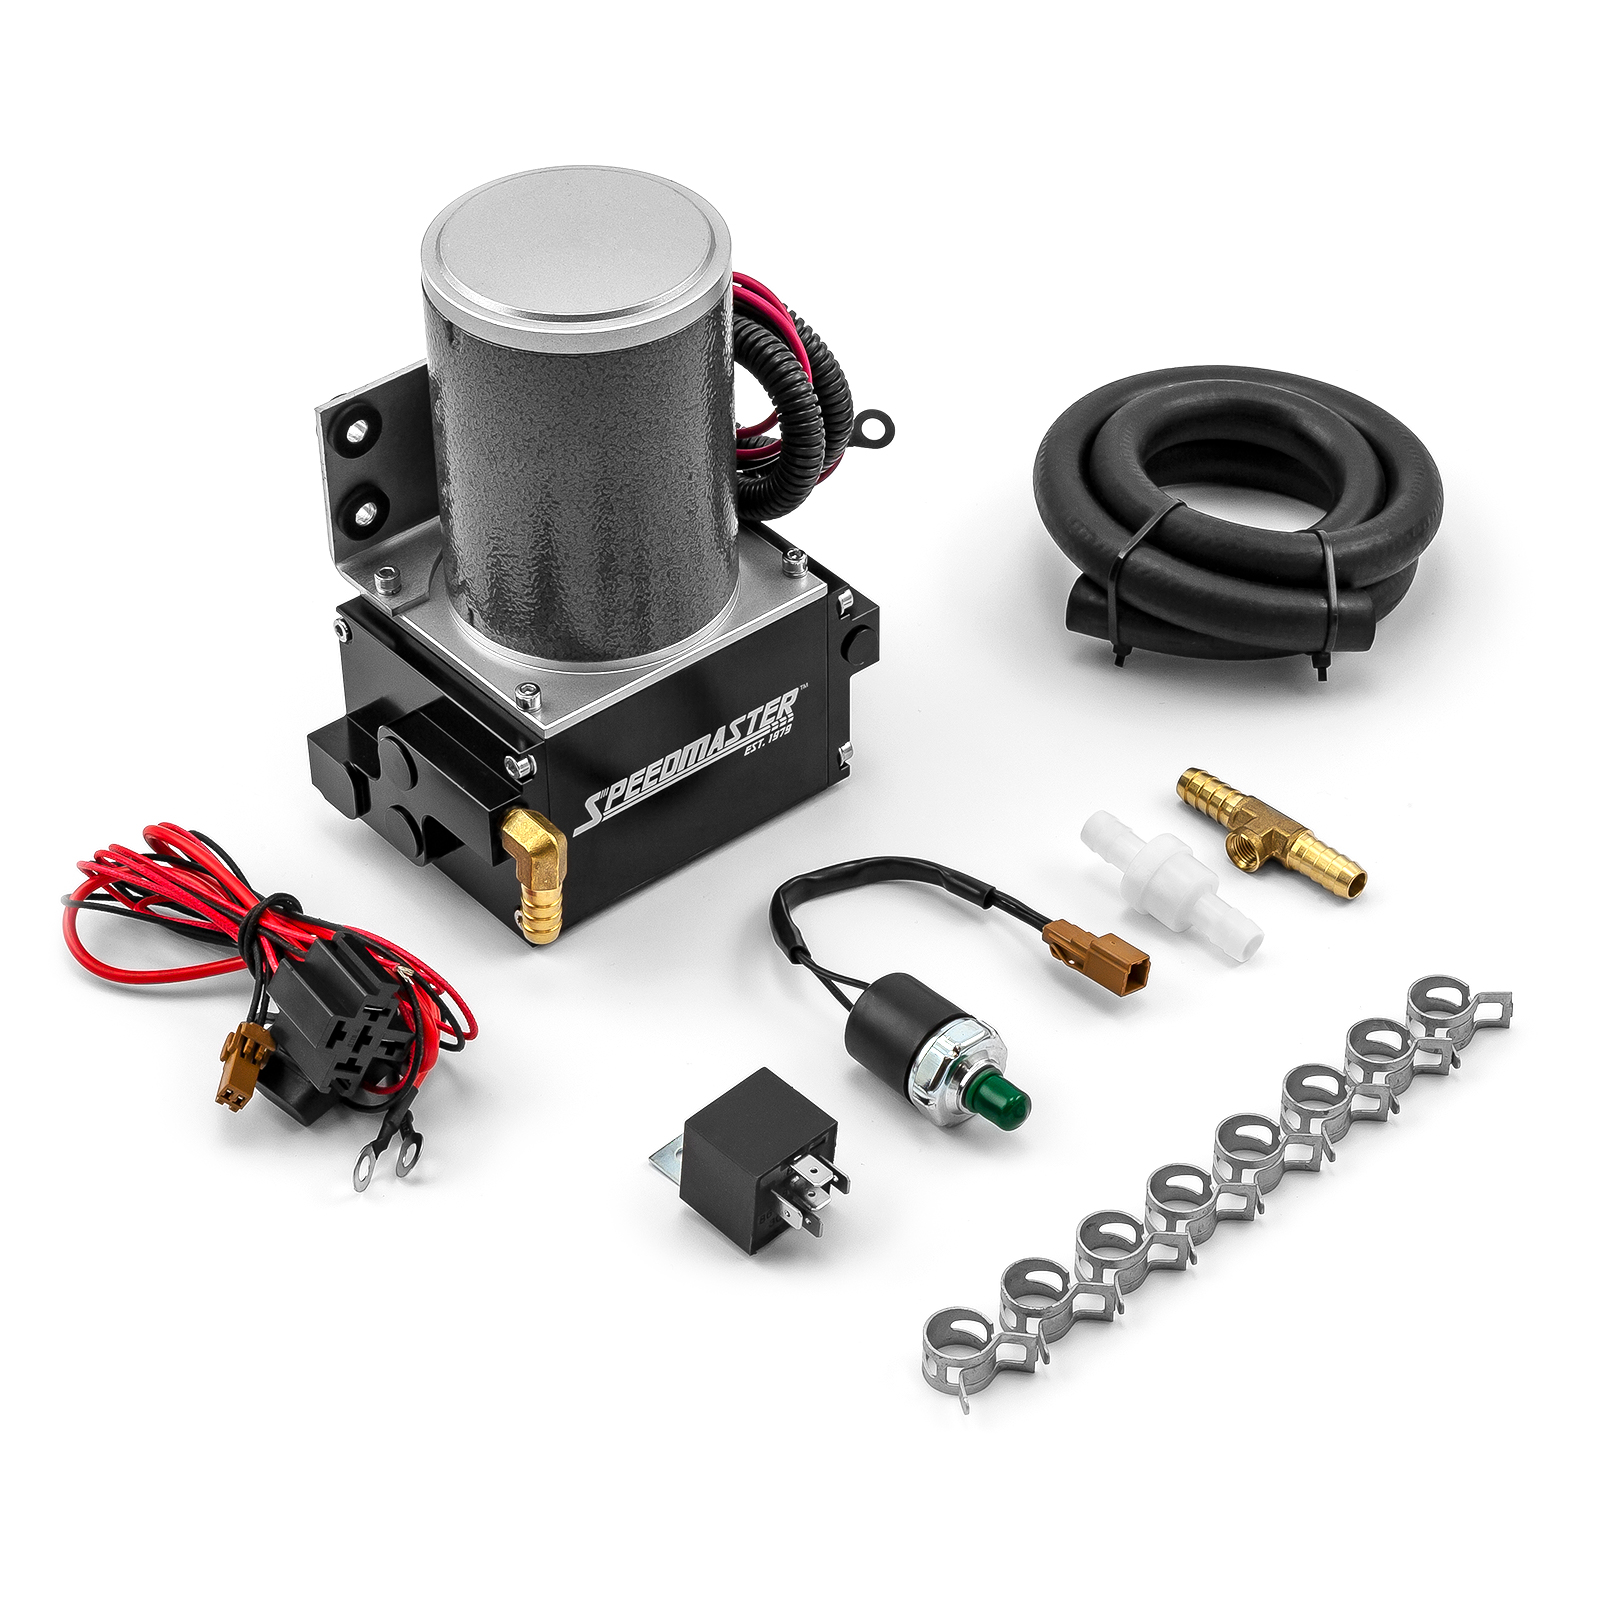 Universal Power Brake Booster 12V Electric Vacuum Pump Kit - Black